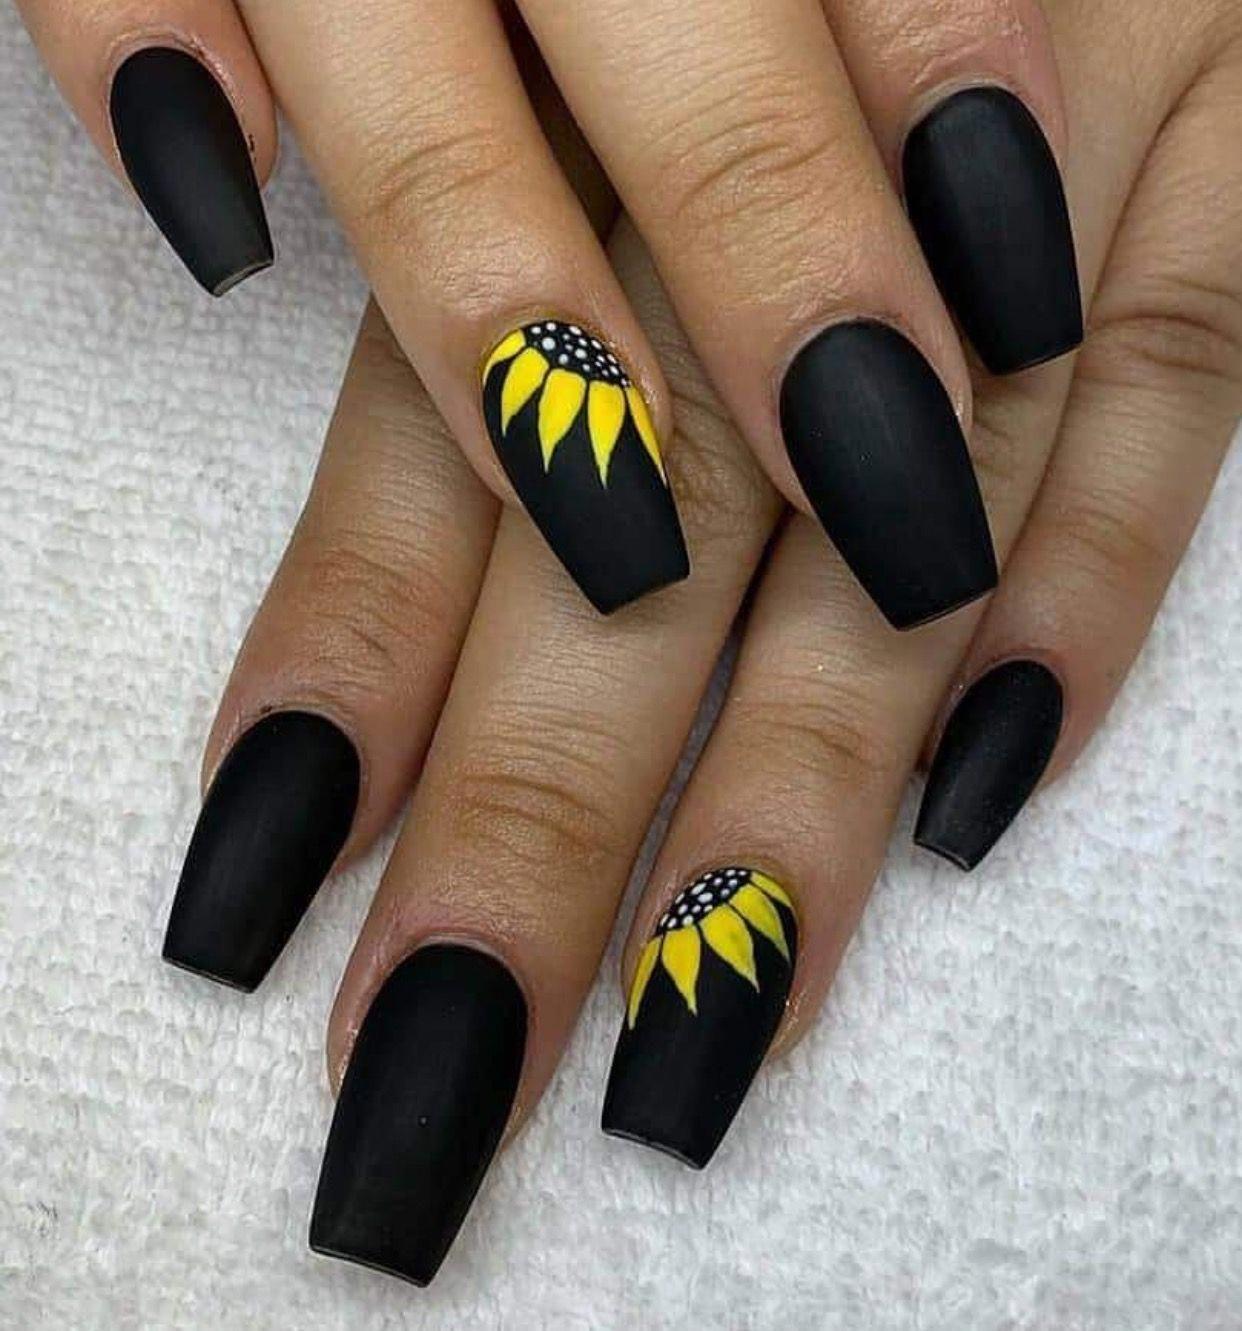 Sunflower Nails Sunflowernails Sunflower Nails Summer Acrylic Nails Short Acrylic Nails Designs